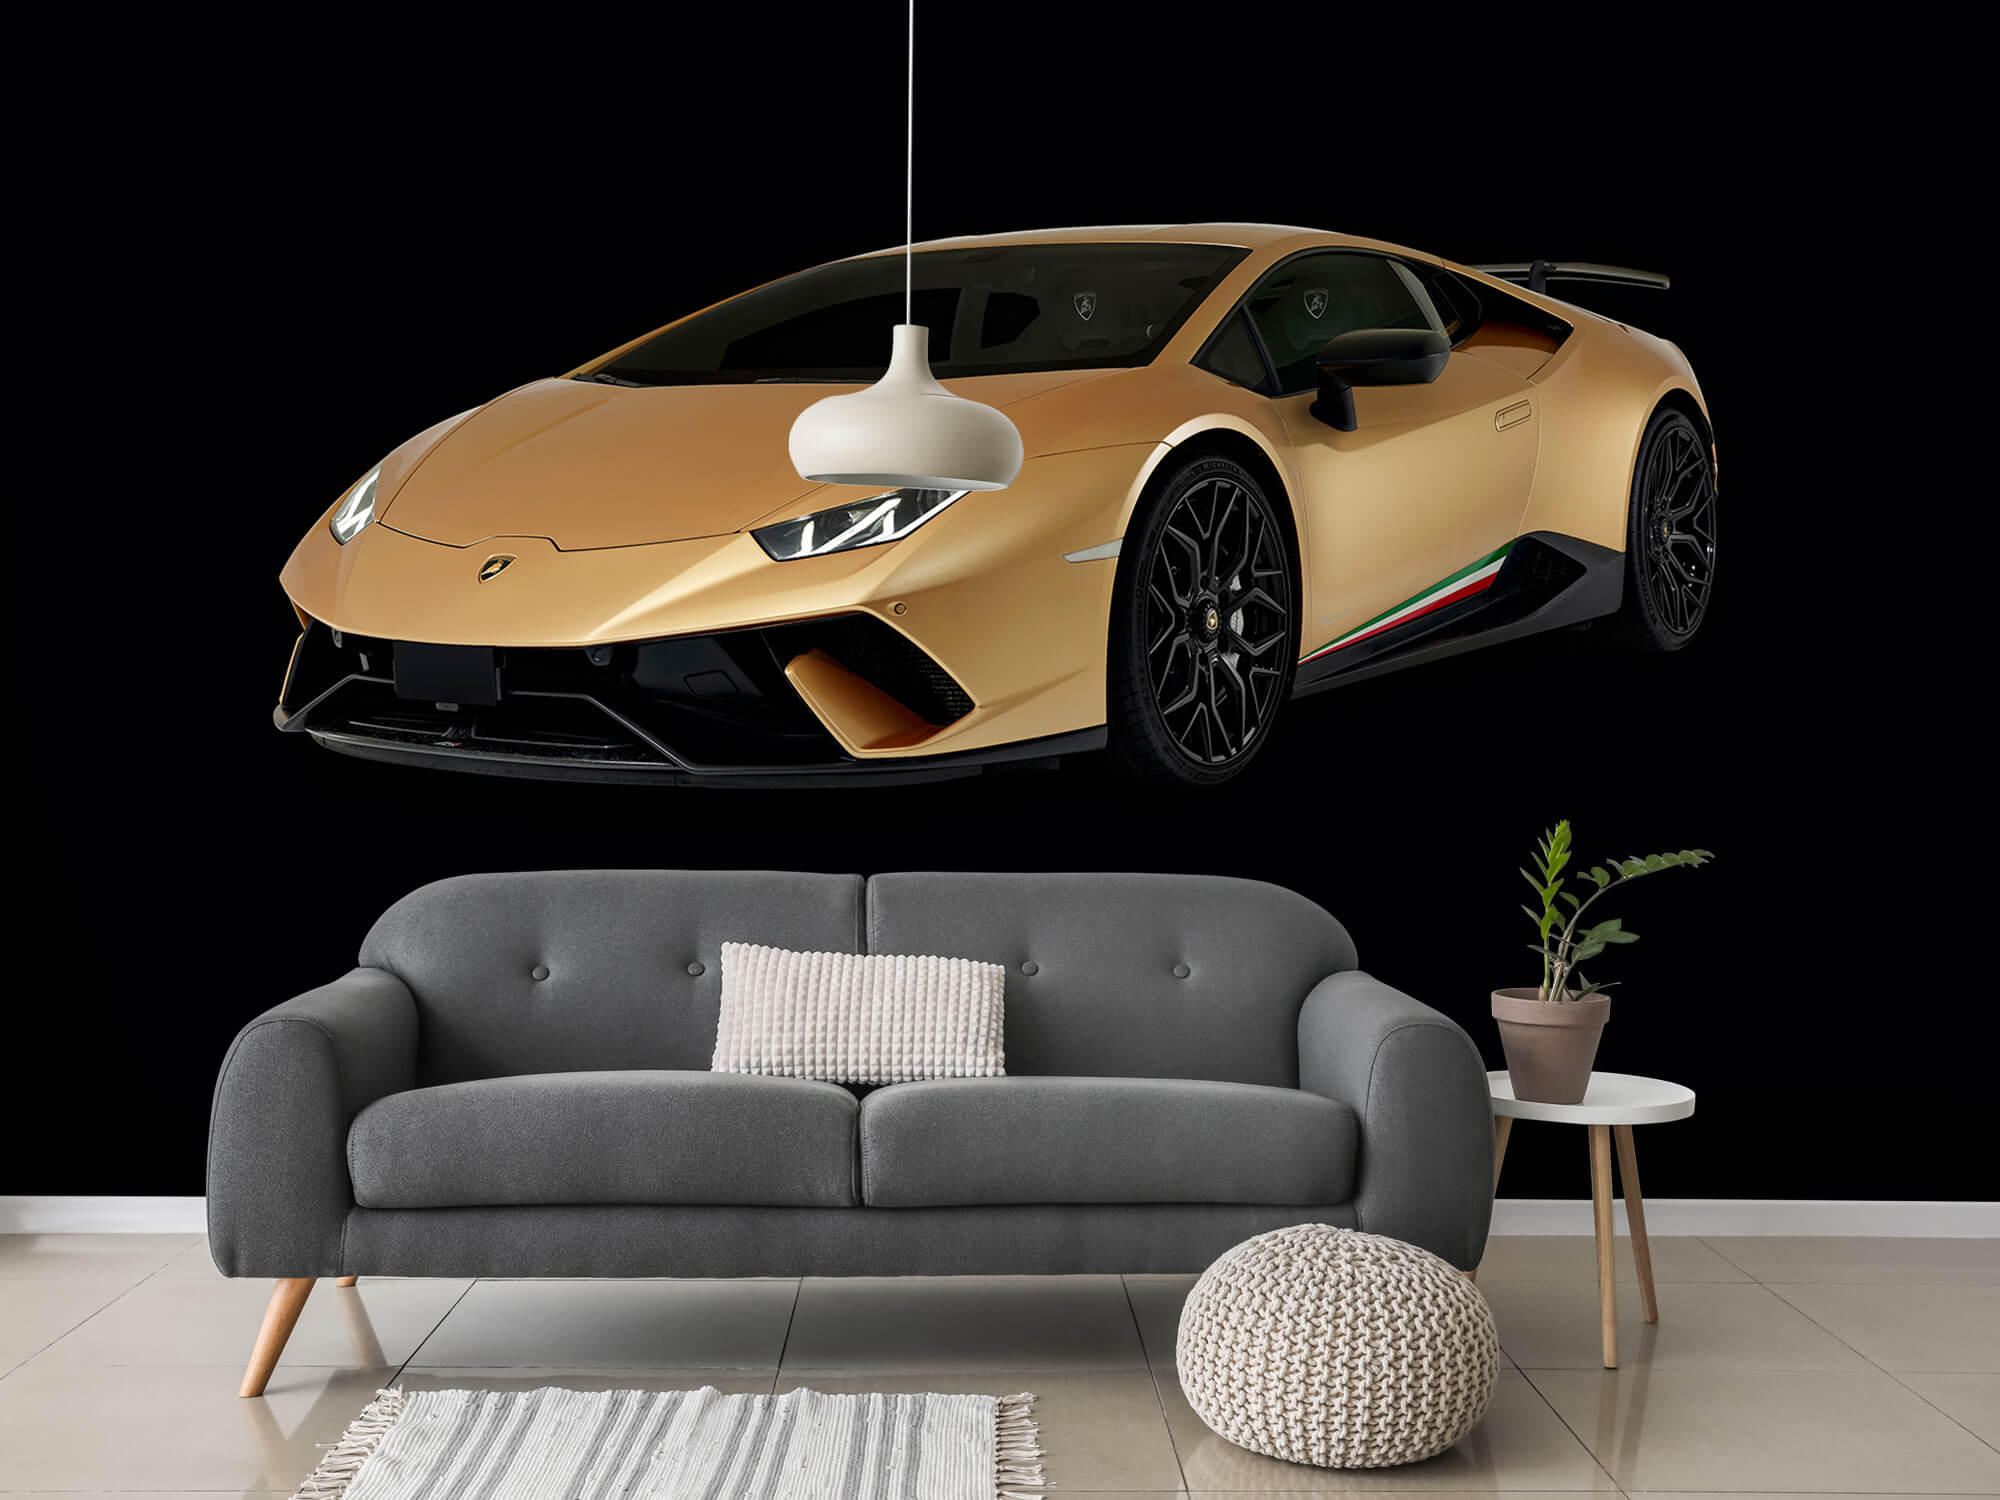 Wallpaper Lamborghini Huracán - Avant droit, noir 15